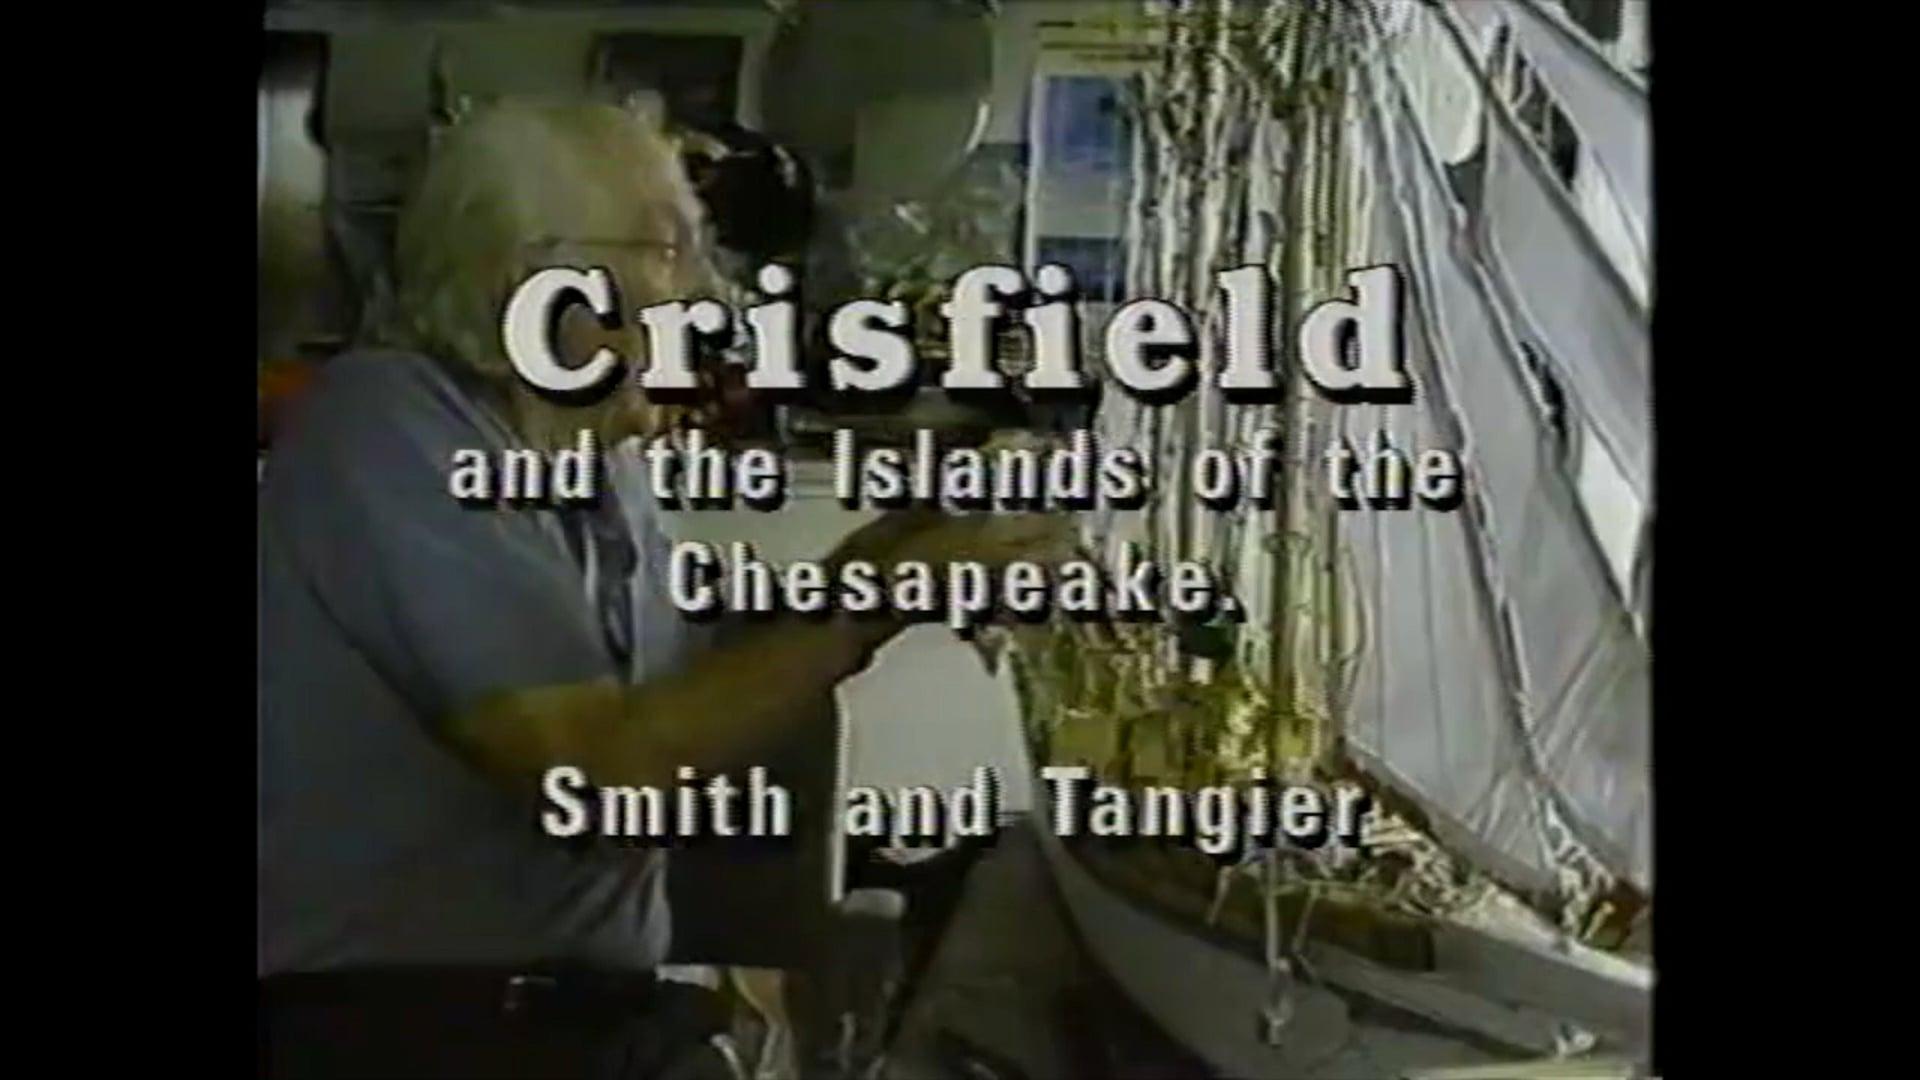 Charlie Adams; The Crisfield Paper Man